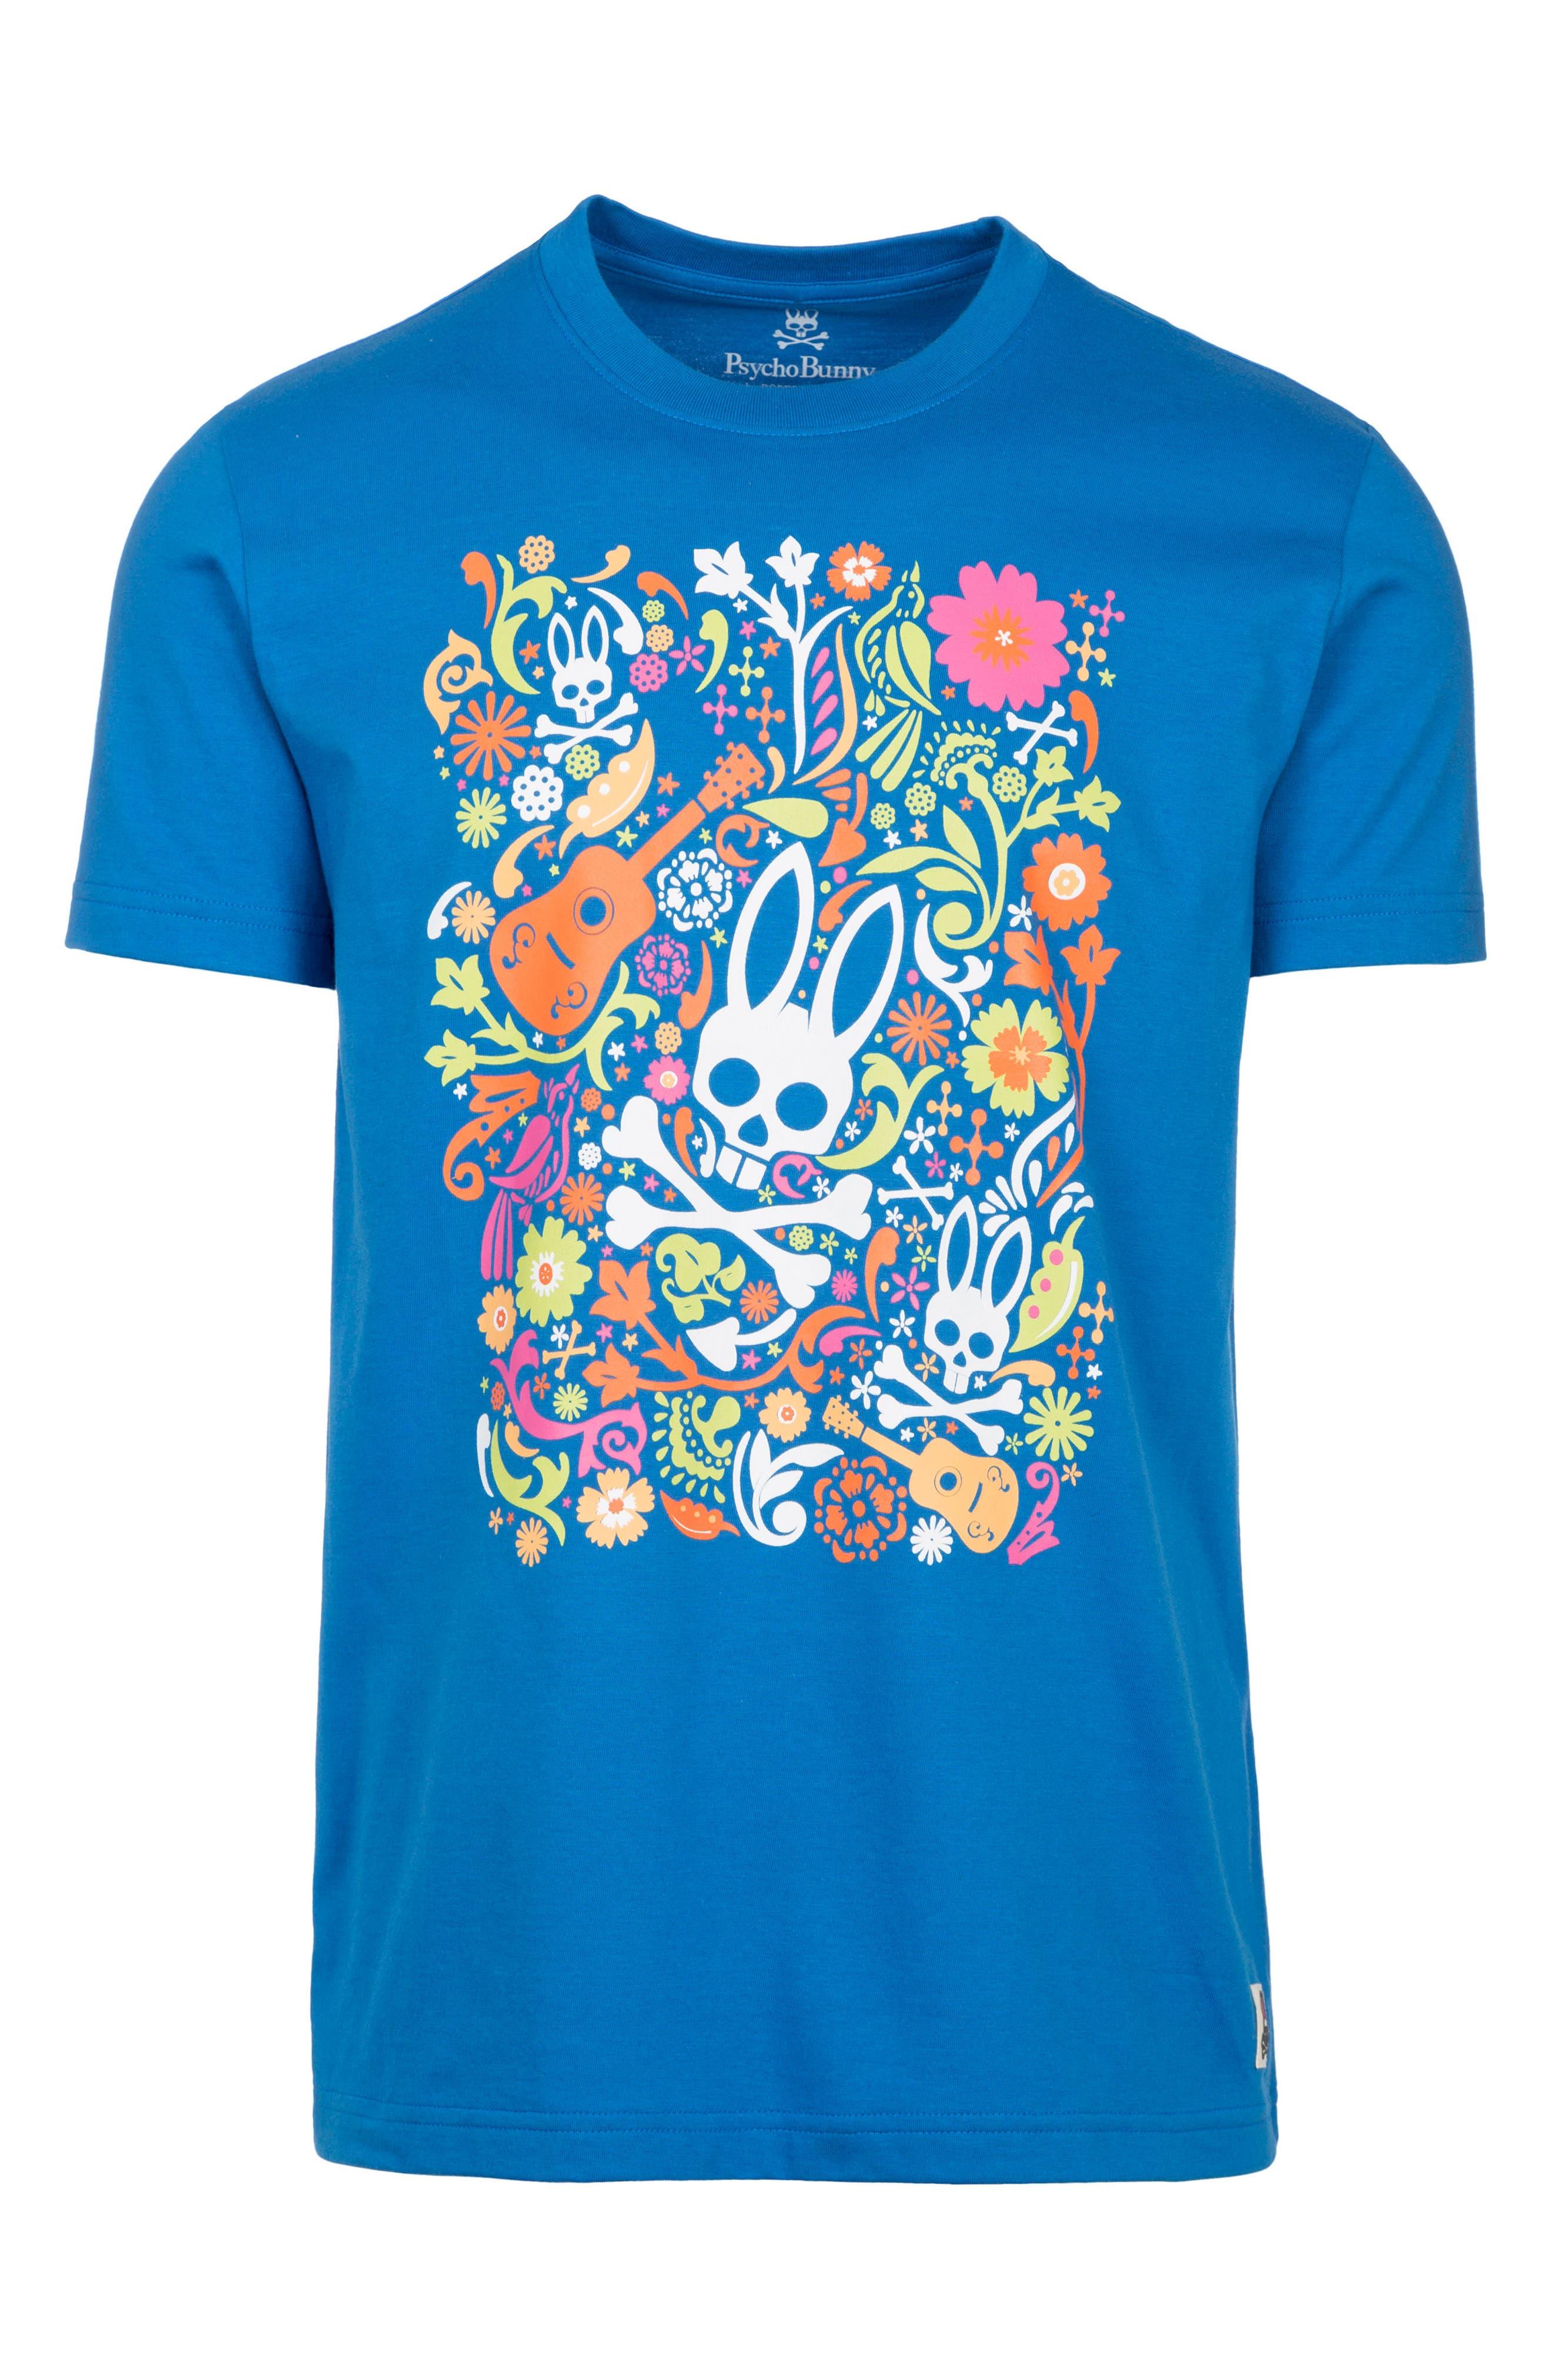 Alternate Image 1 Selected - Psycho Bunny Graphic T-Shirt (Little Boys & Big Boys)